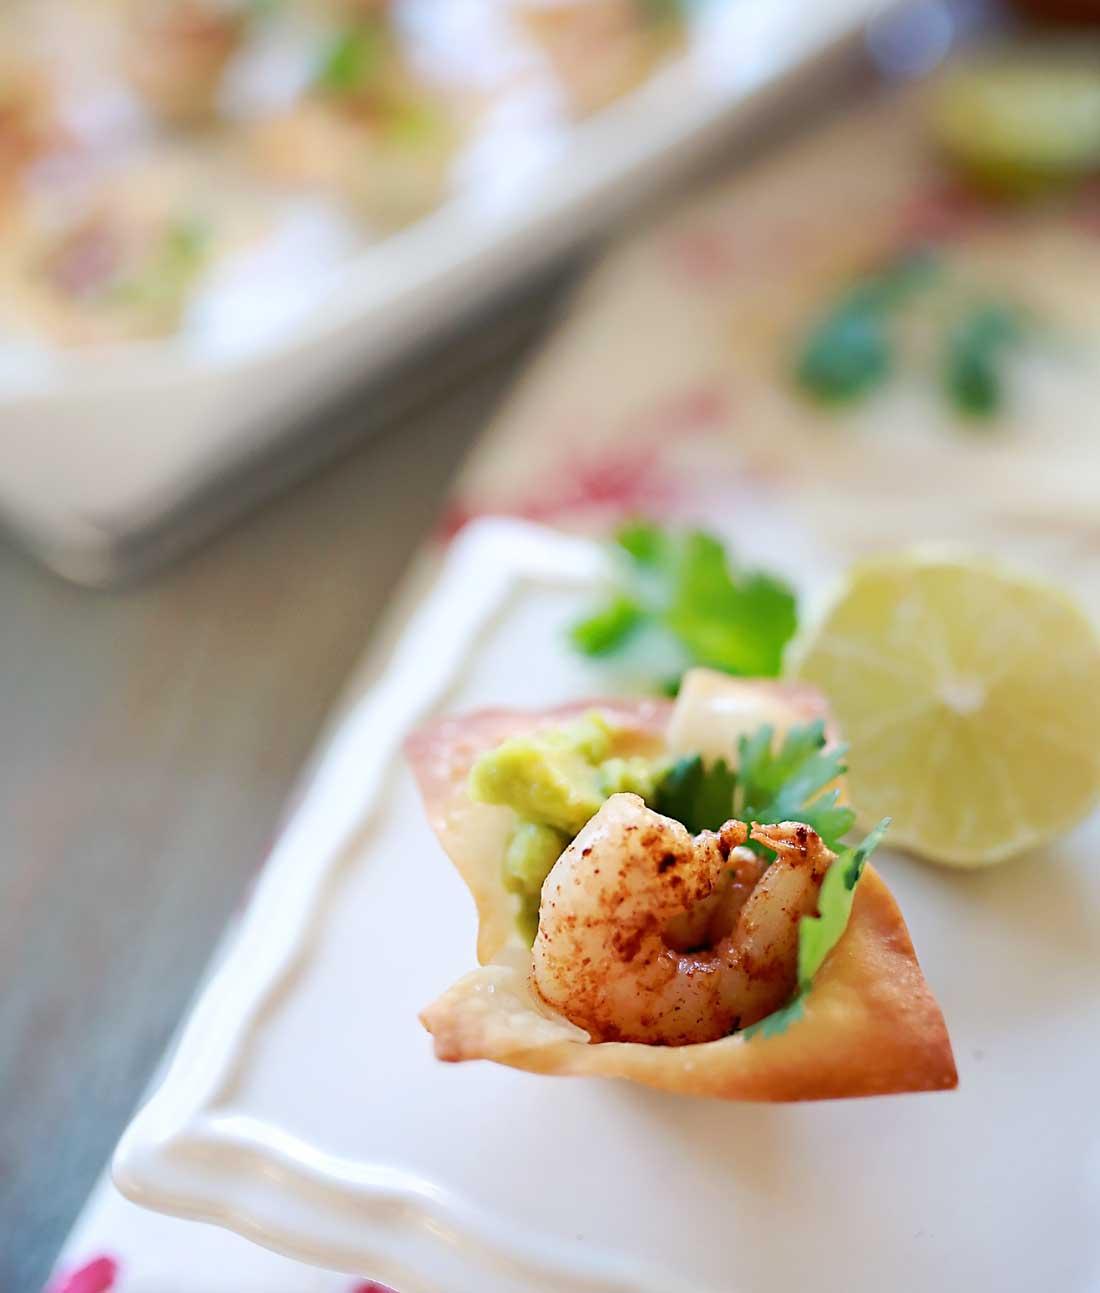 Sooo good Avocado ad spicy shrimp bites!